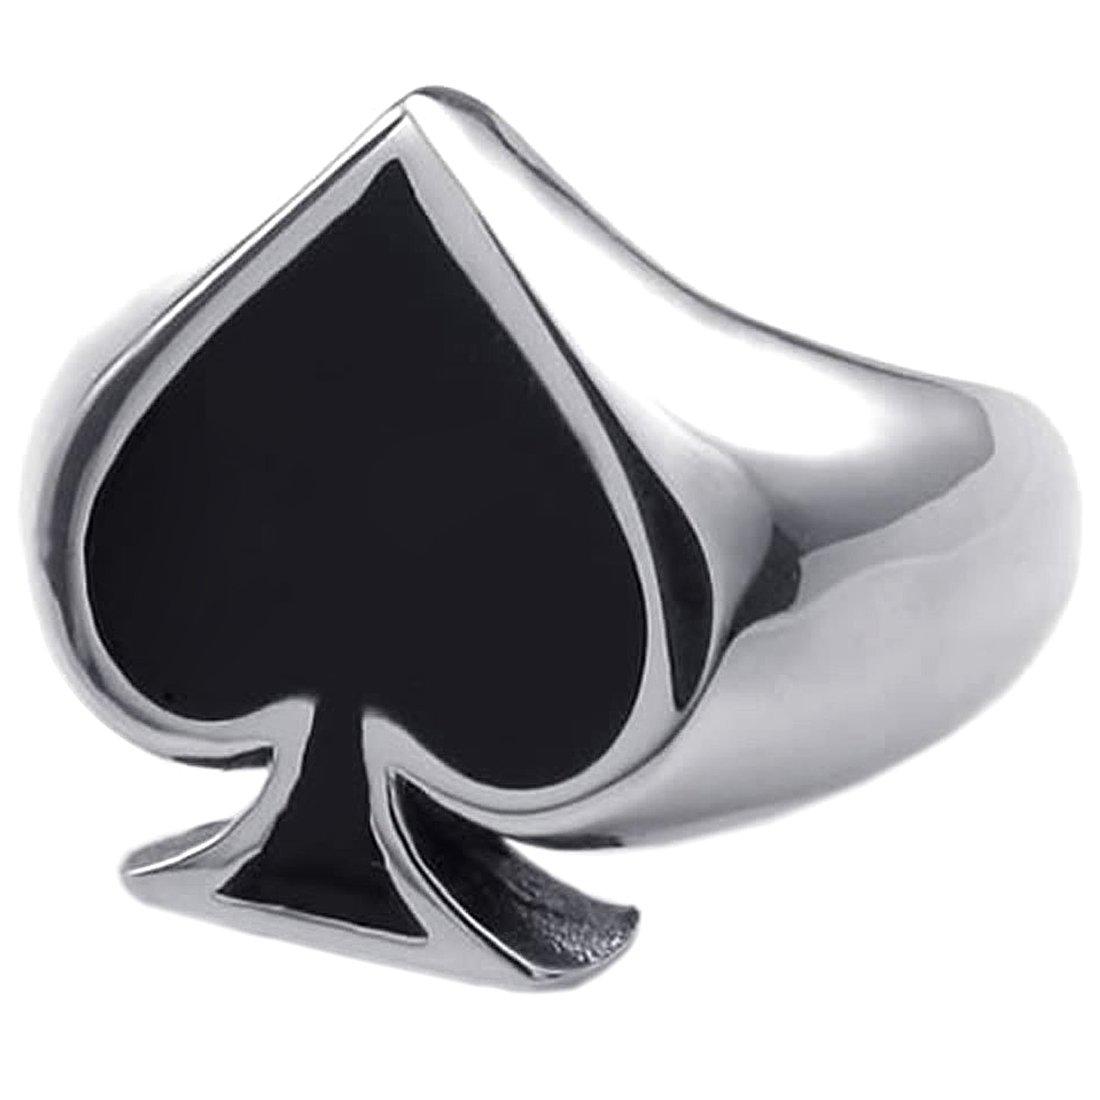 TOOGOO Joya Anillo Hombre Mujer Plata Negro Picas de Poker Acero Inoxidable Anillos Naipe 18.2 mm con Bolsa de Regalo